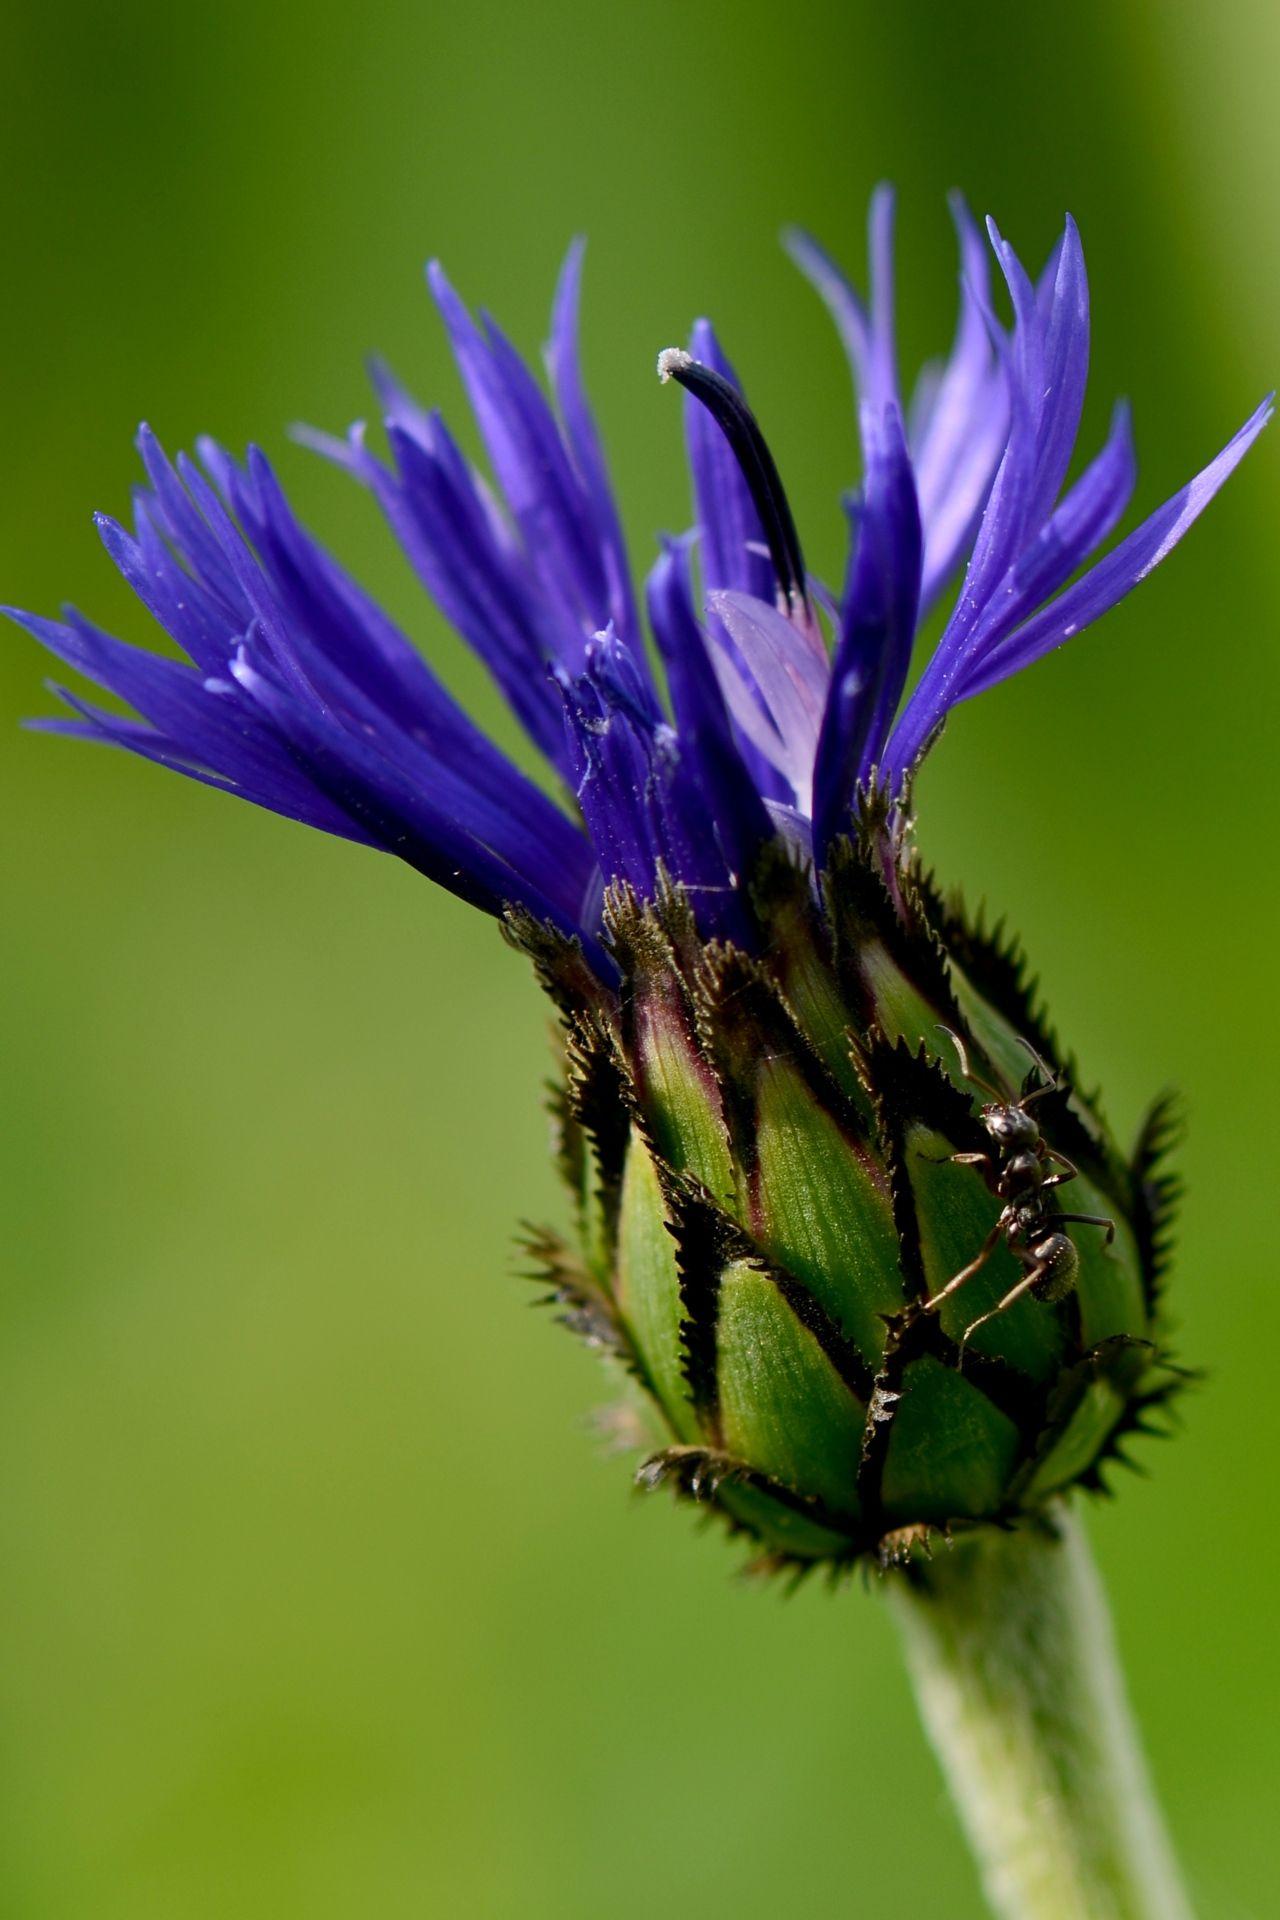 True Blue Bachelor S Button A Clear Choice For Beginning Gardeners Bachelor Button Flowers Beautiful Flowers Blue Flowers